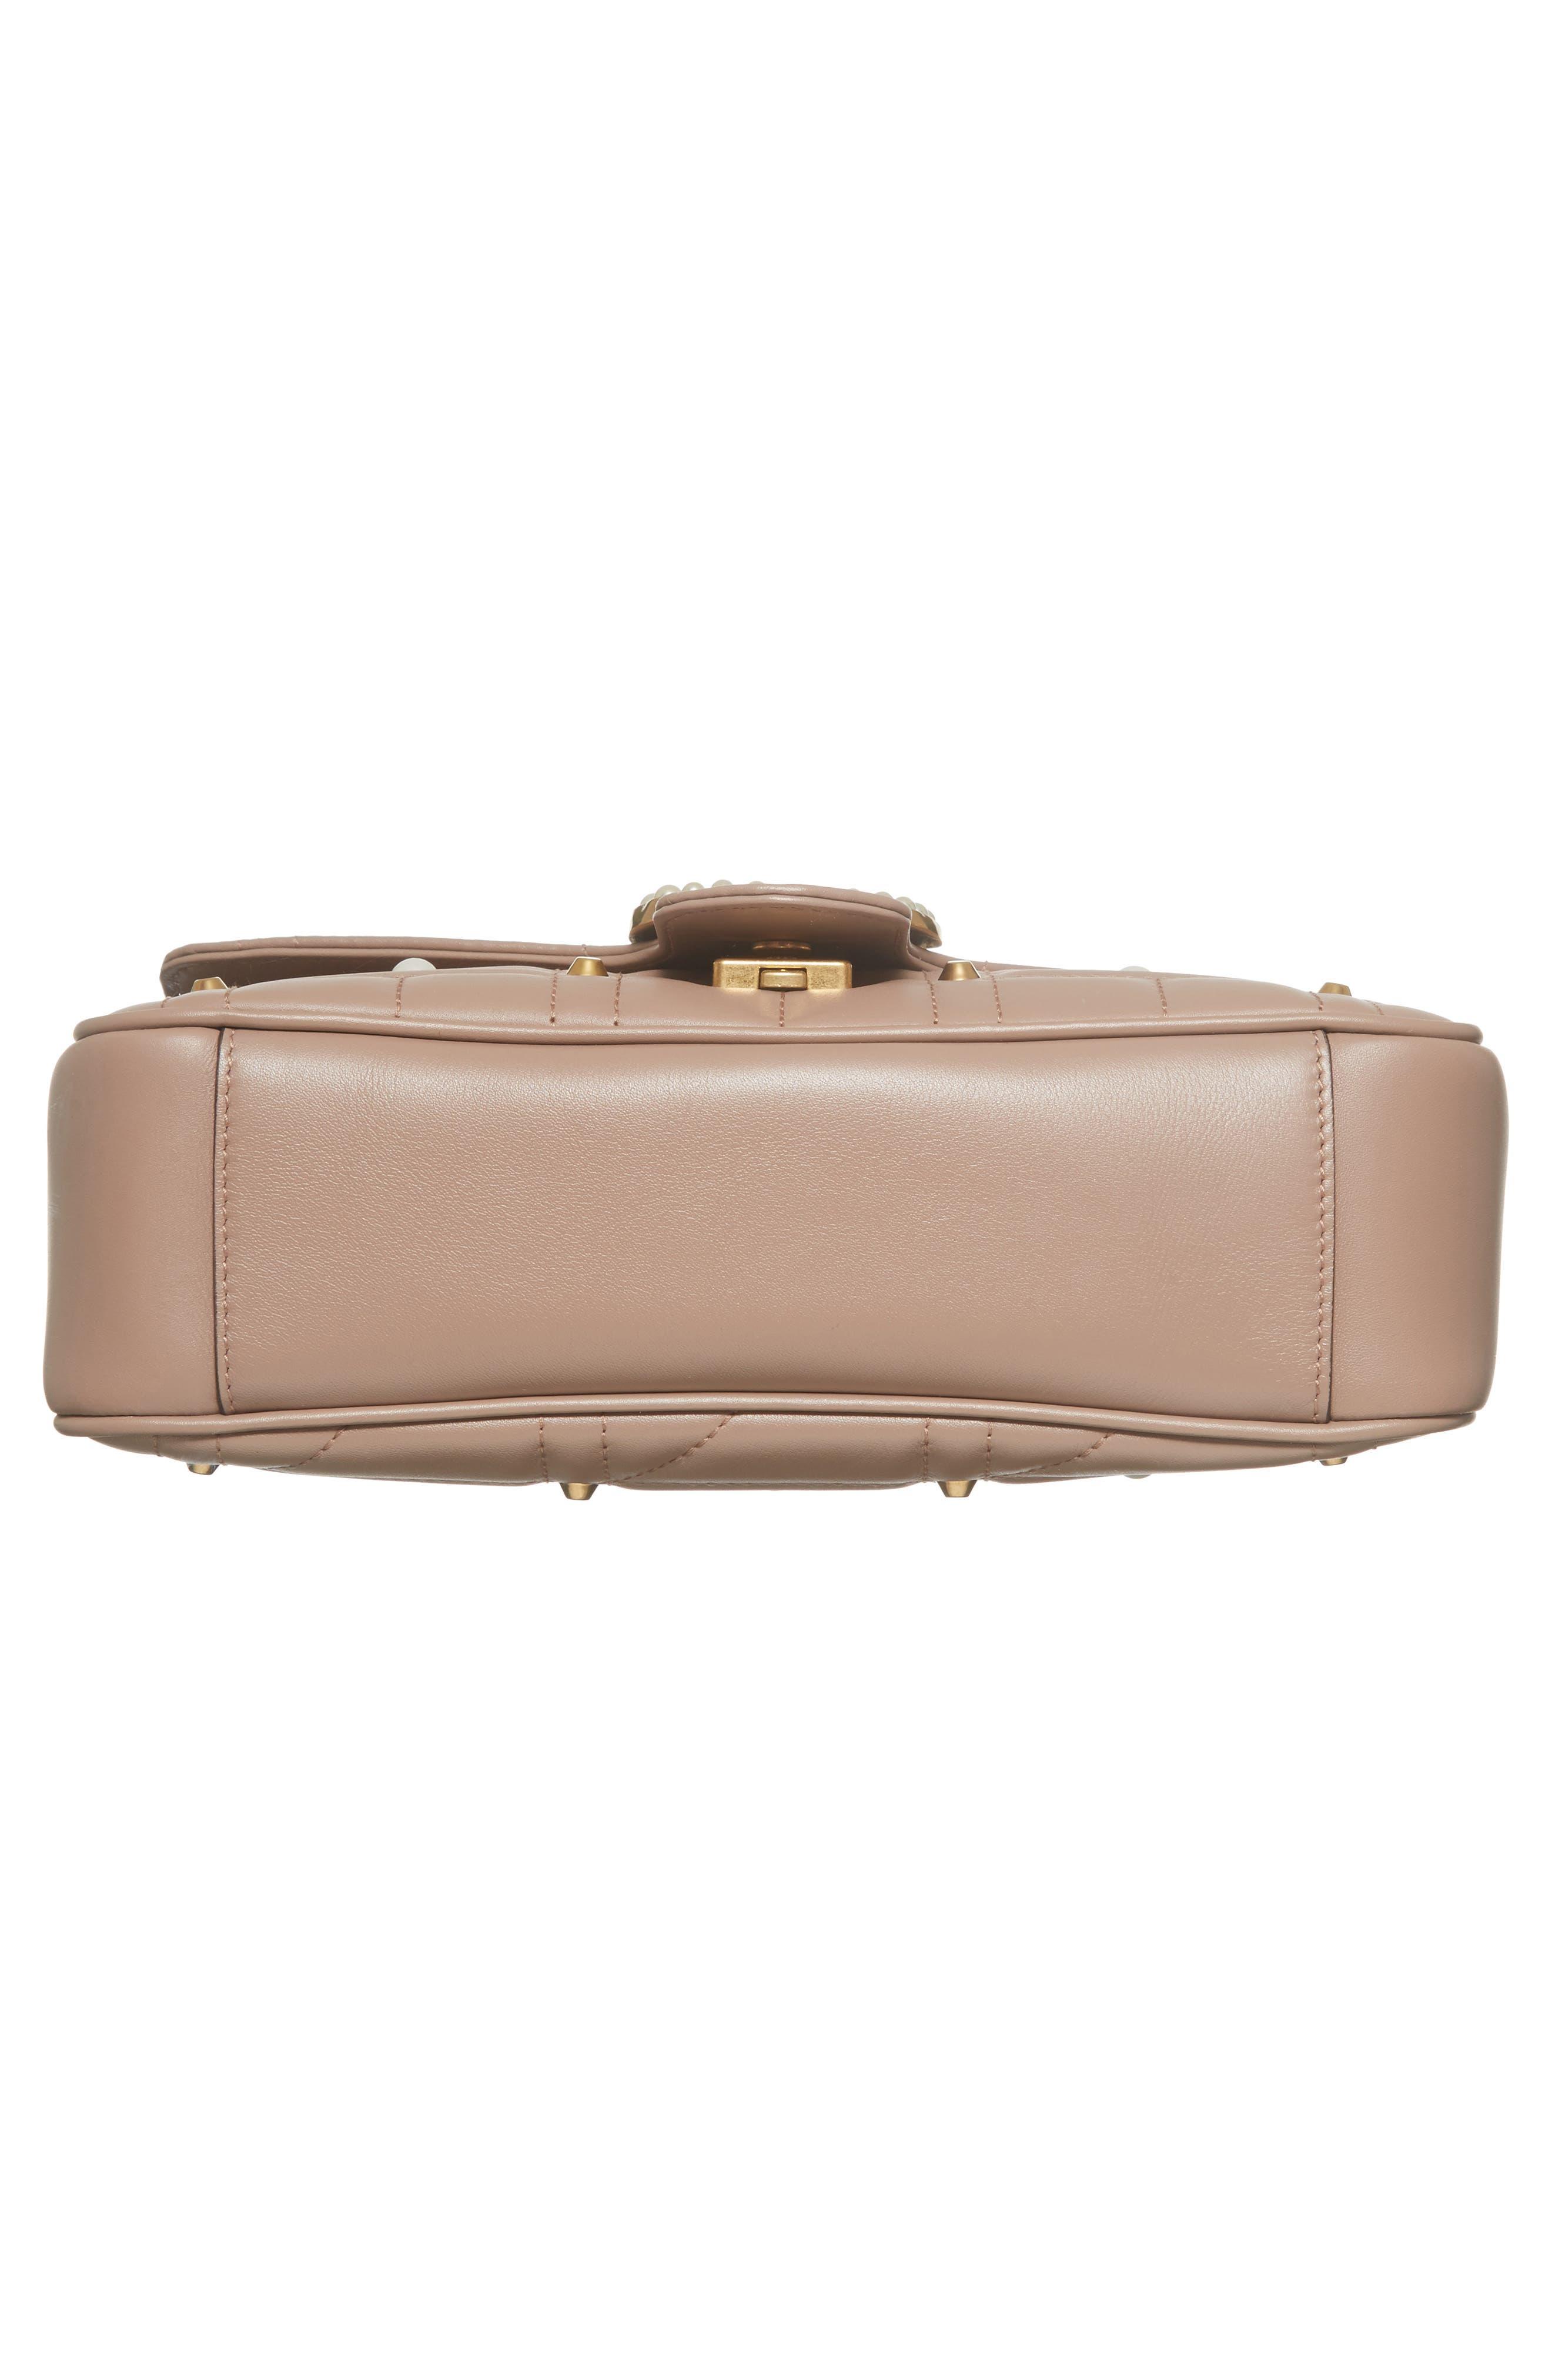 GG Marmont Matelassé Imitation Pearl Leather Shoulder Bag,                             Alternate thumbnail 5, color,                             White/ Pink